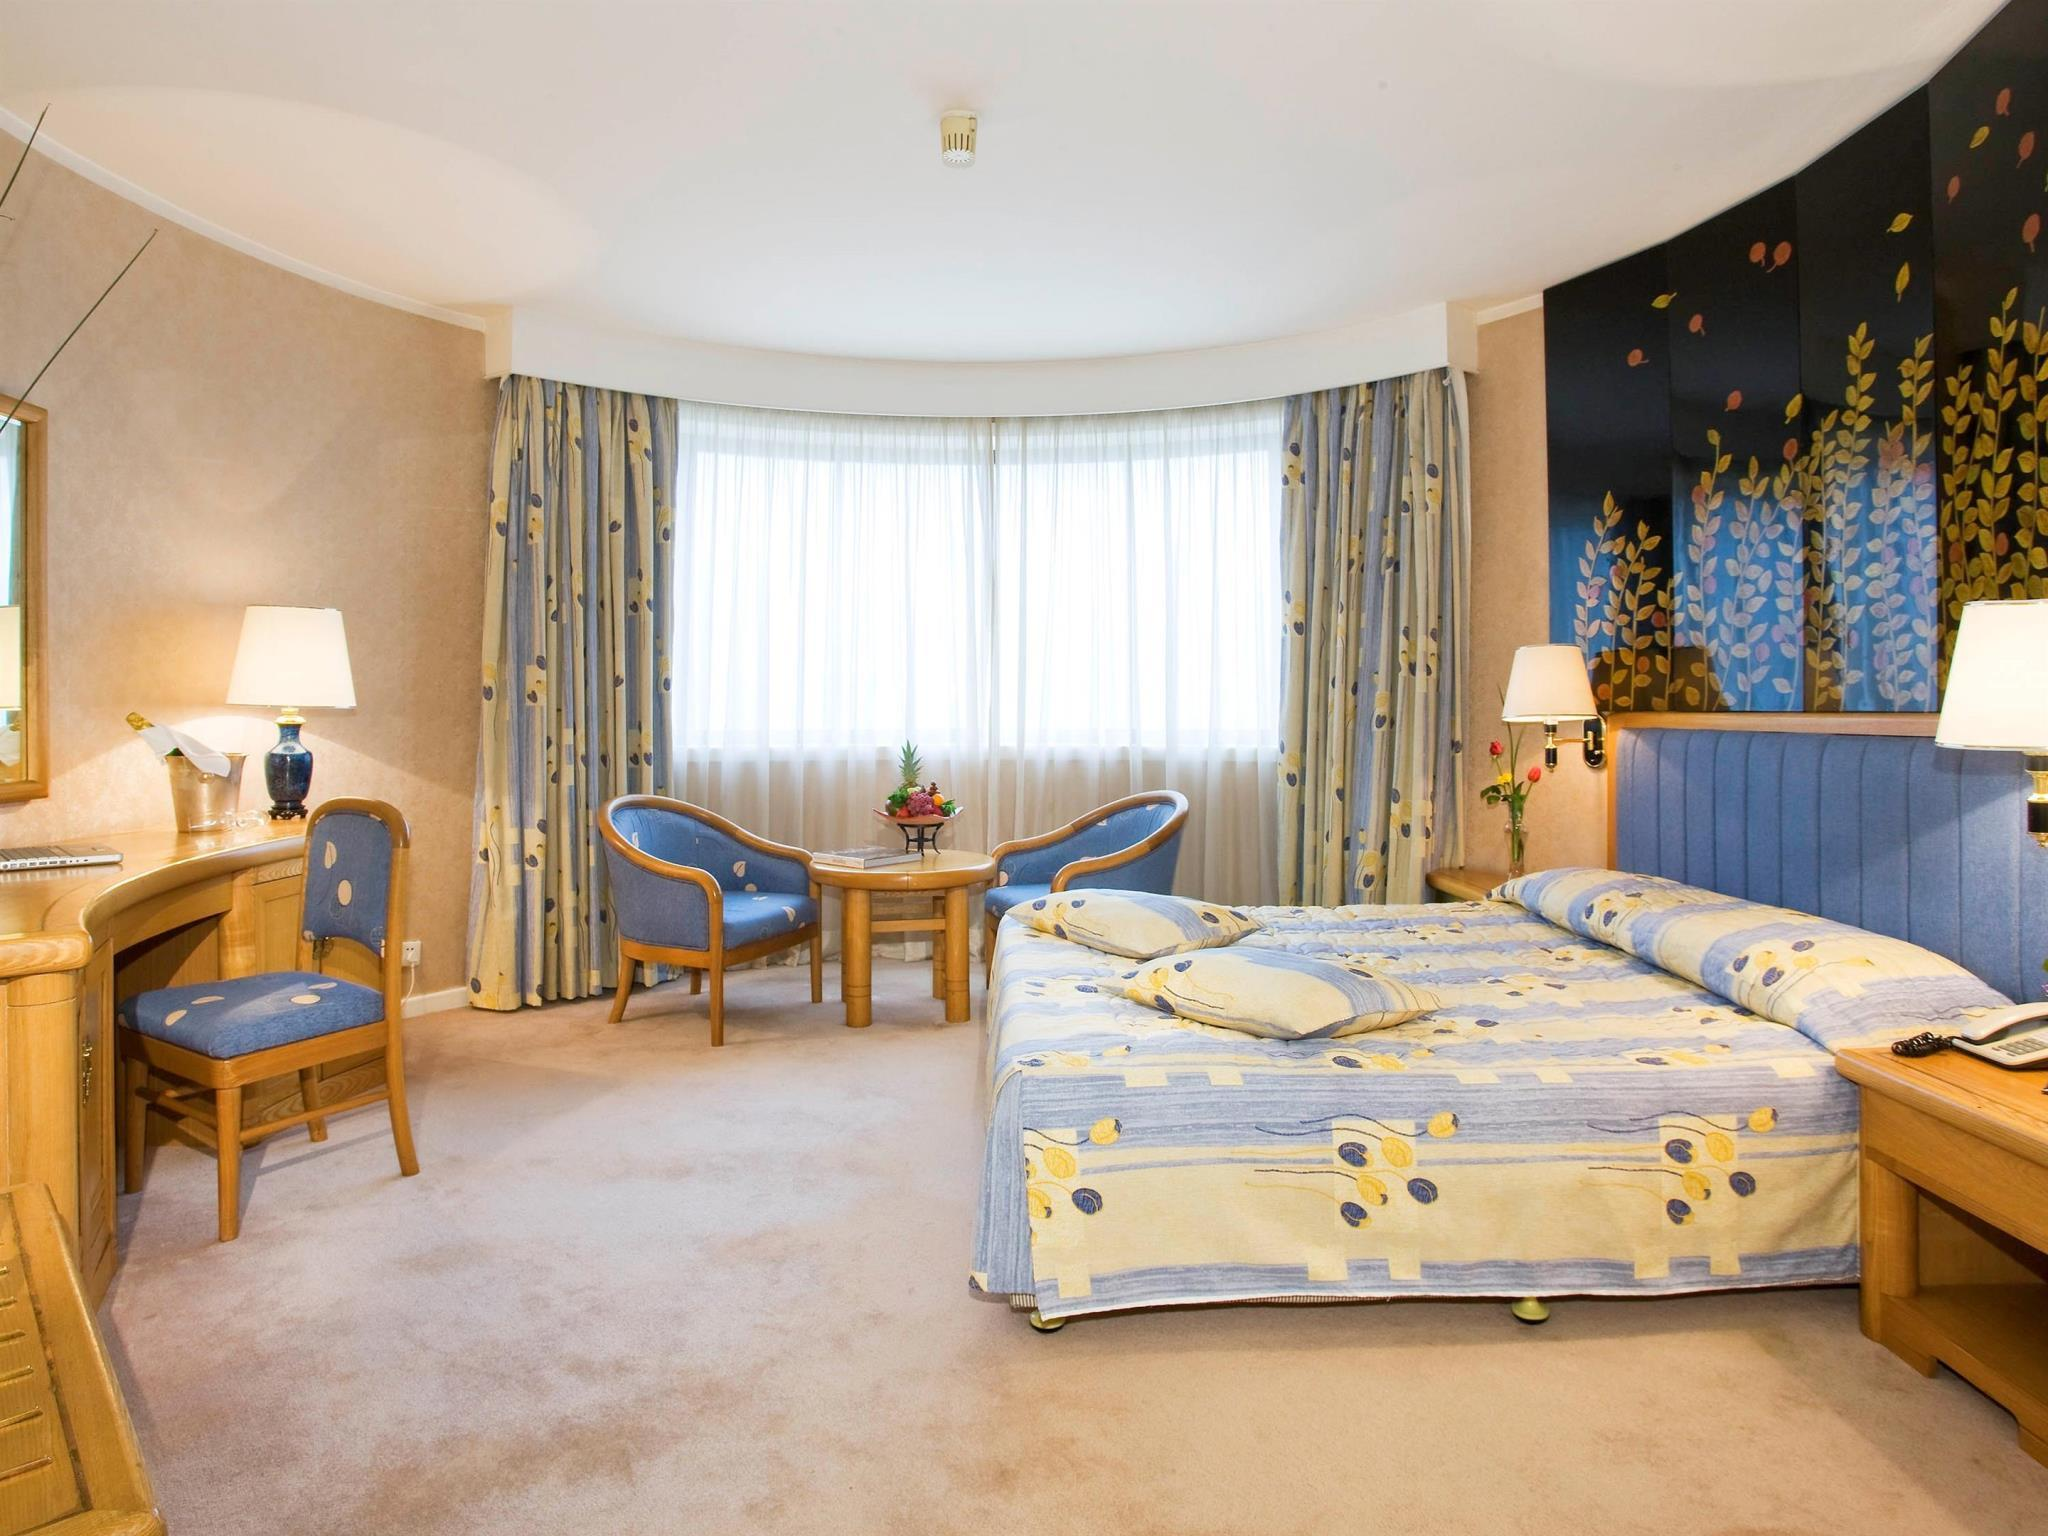 Design Furniture Bab Ezzouar 🟊🟊🟊🟊🟊 grand hotel mercure alger aeroport - algiers